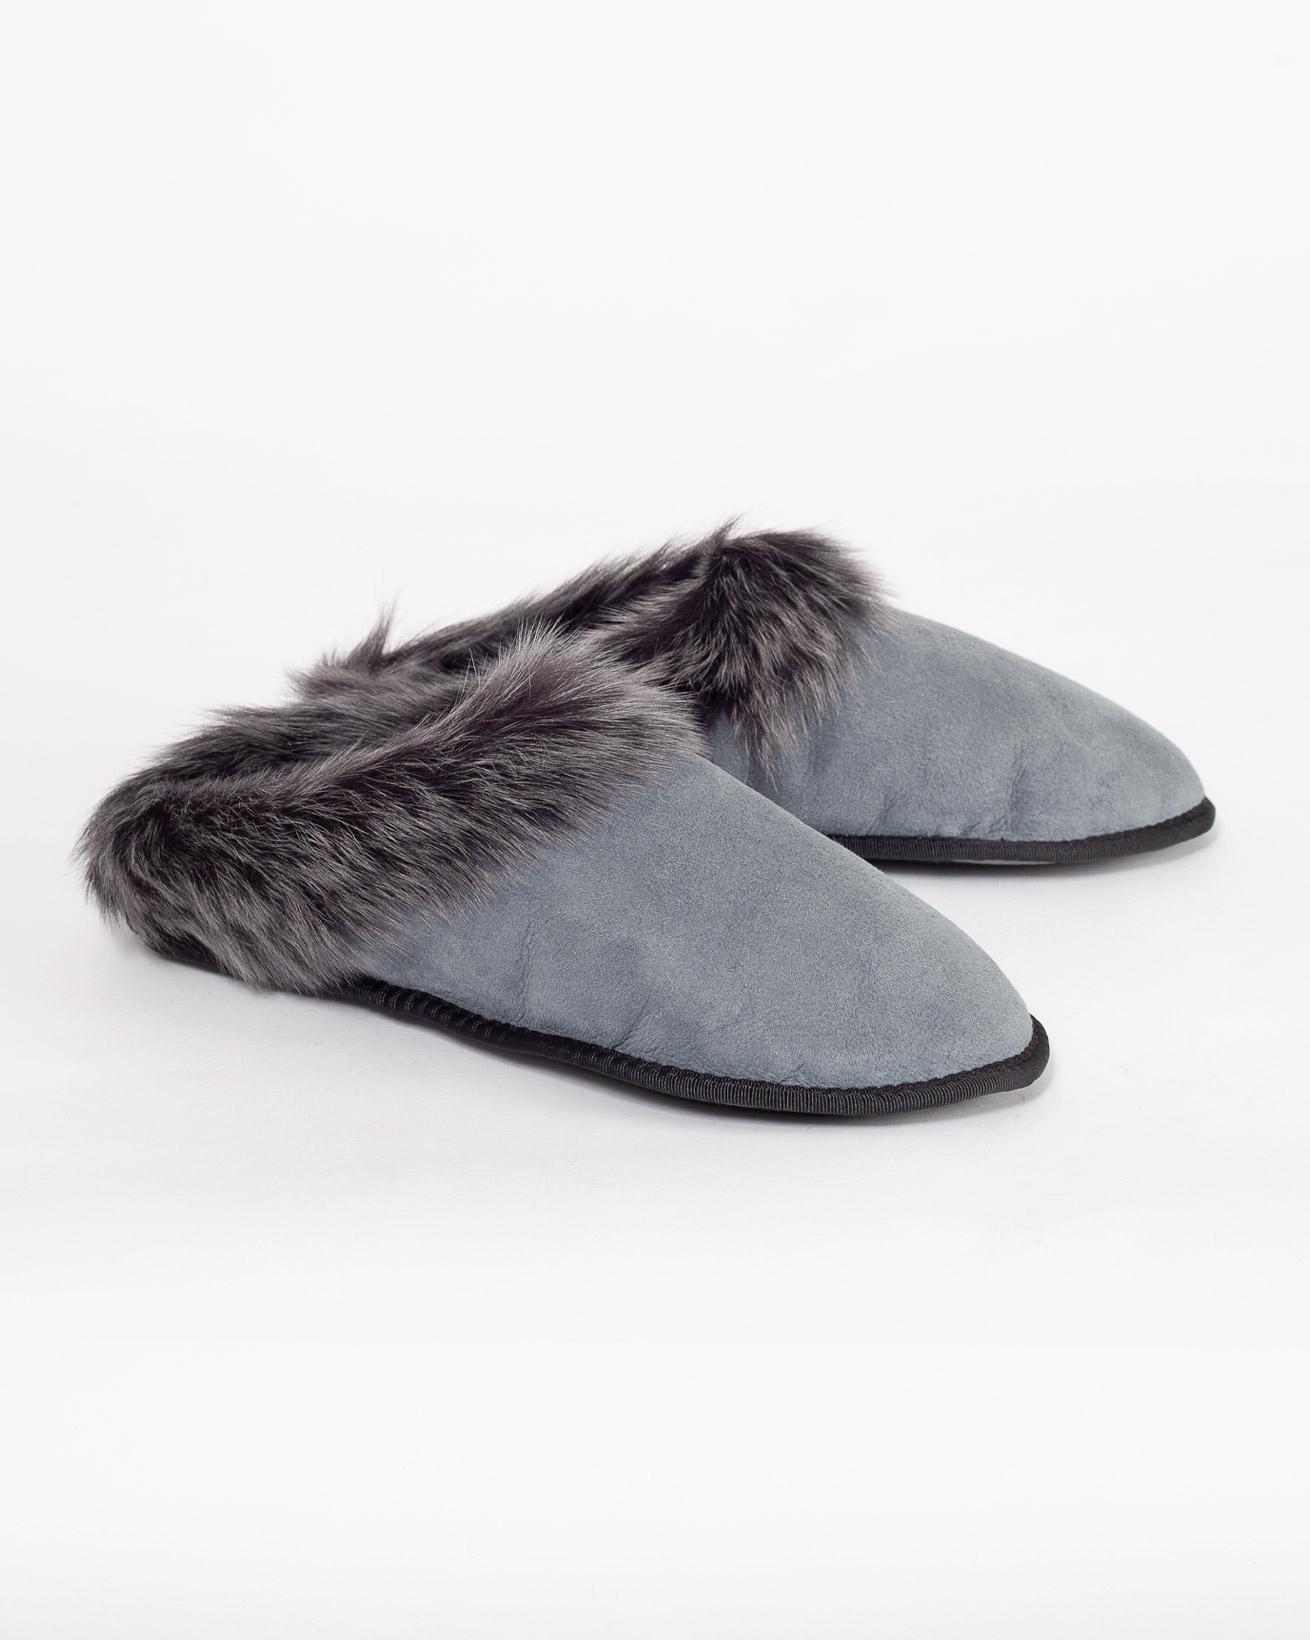 Toscana Cobi Slipper - Light Grey - Size 3 - 1216